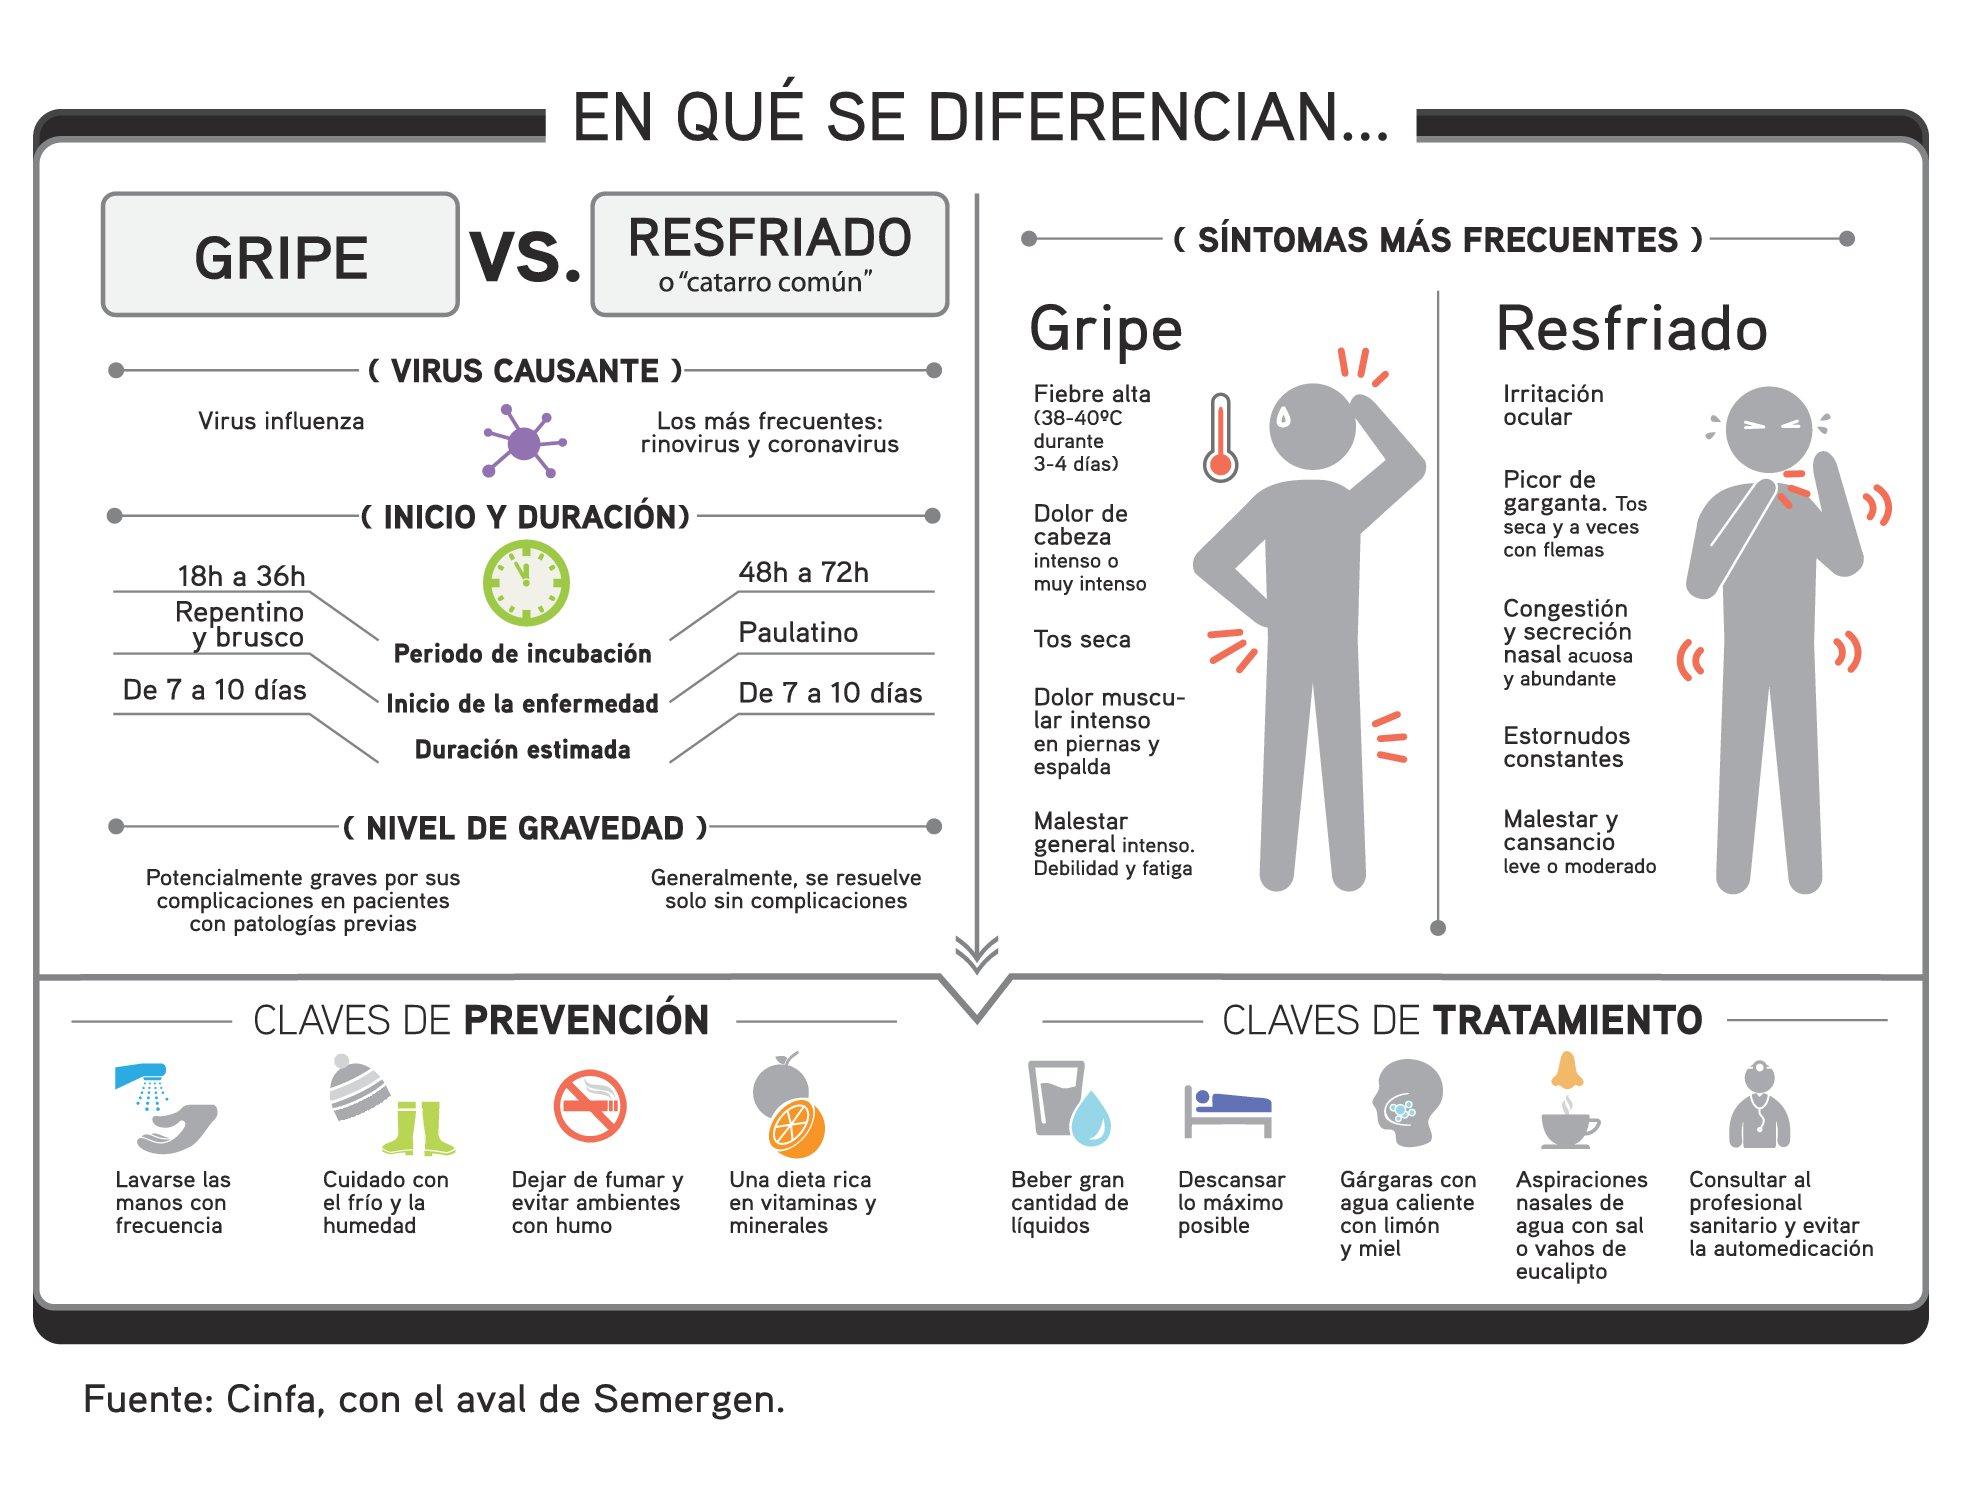 INFOGRAFICO_Resfriado_vs_Gripe_Cinfa